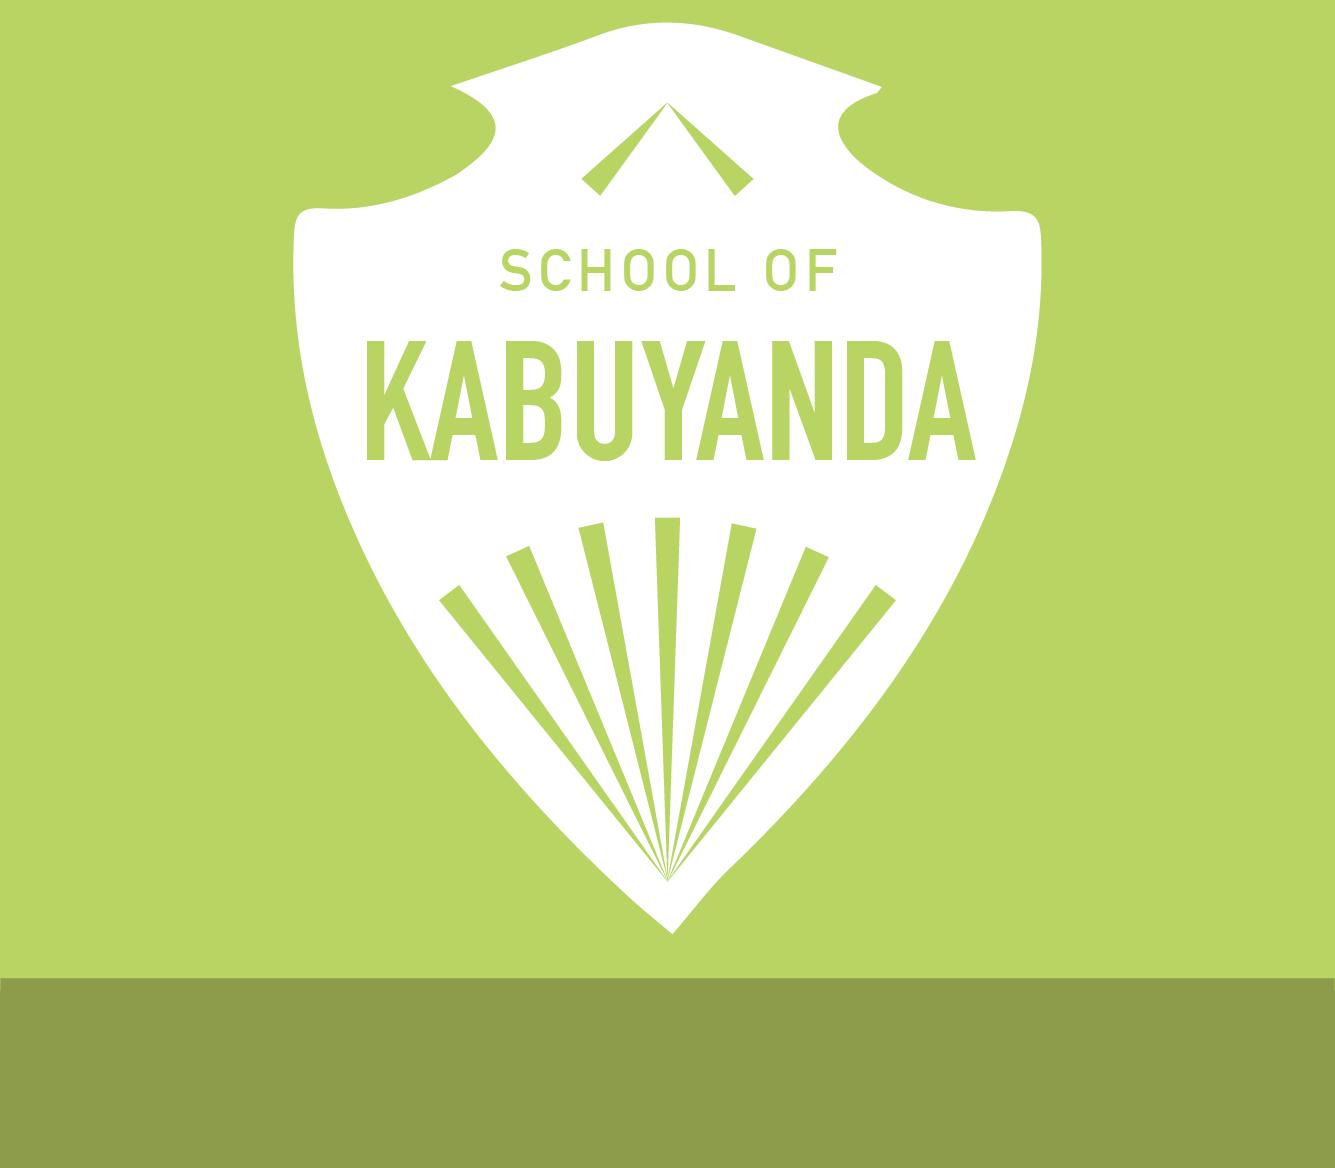 School of kabuyanda